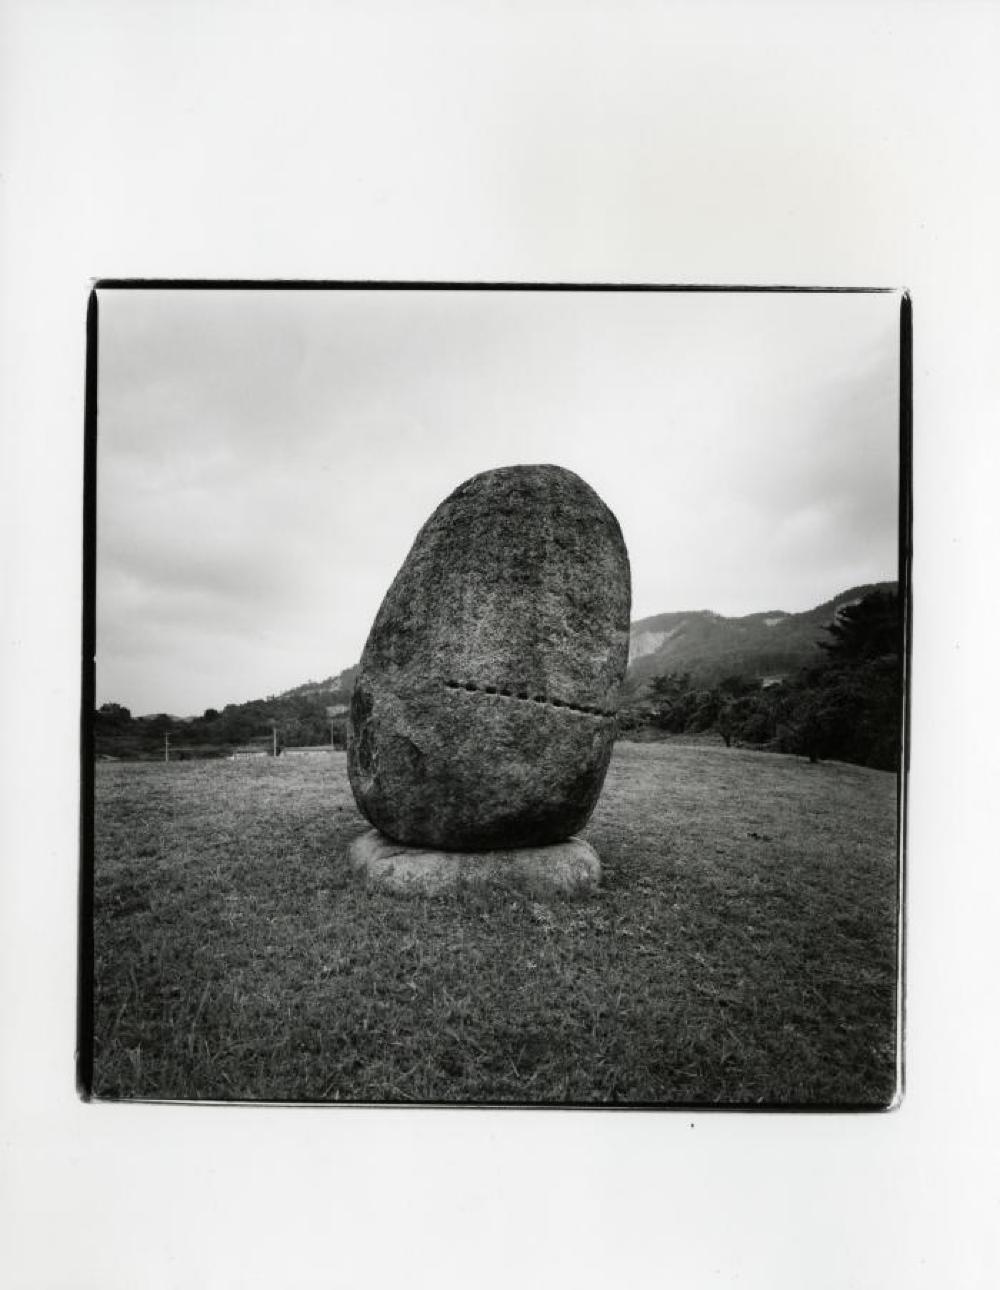 Isamu Noguchi's grave in Mure